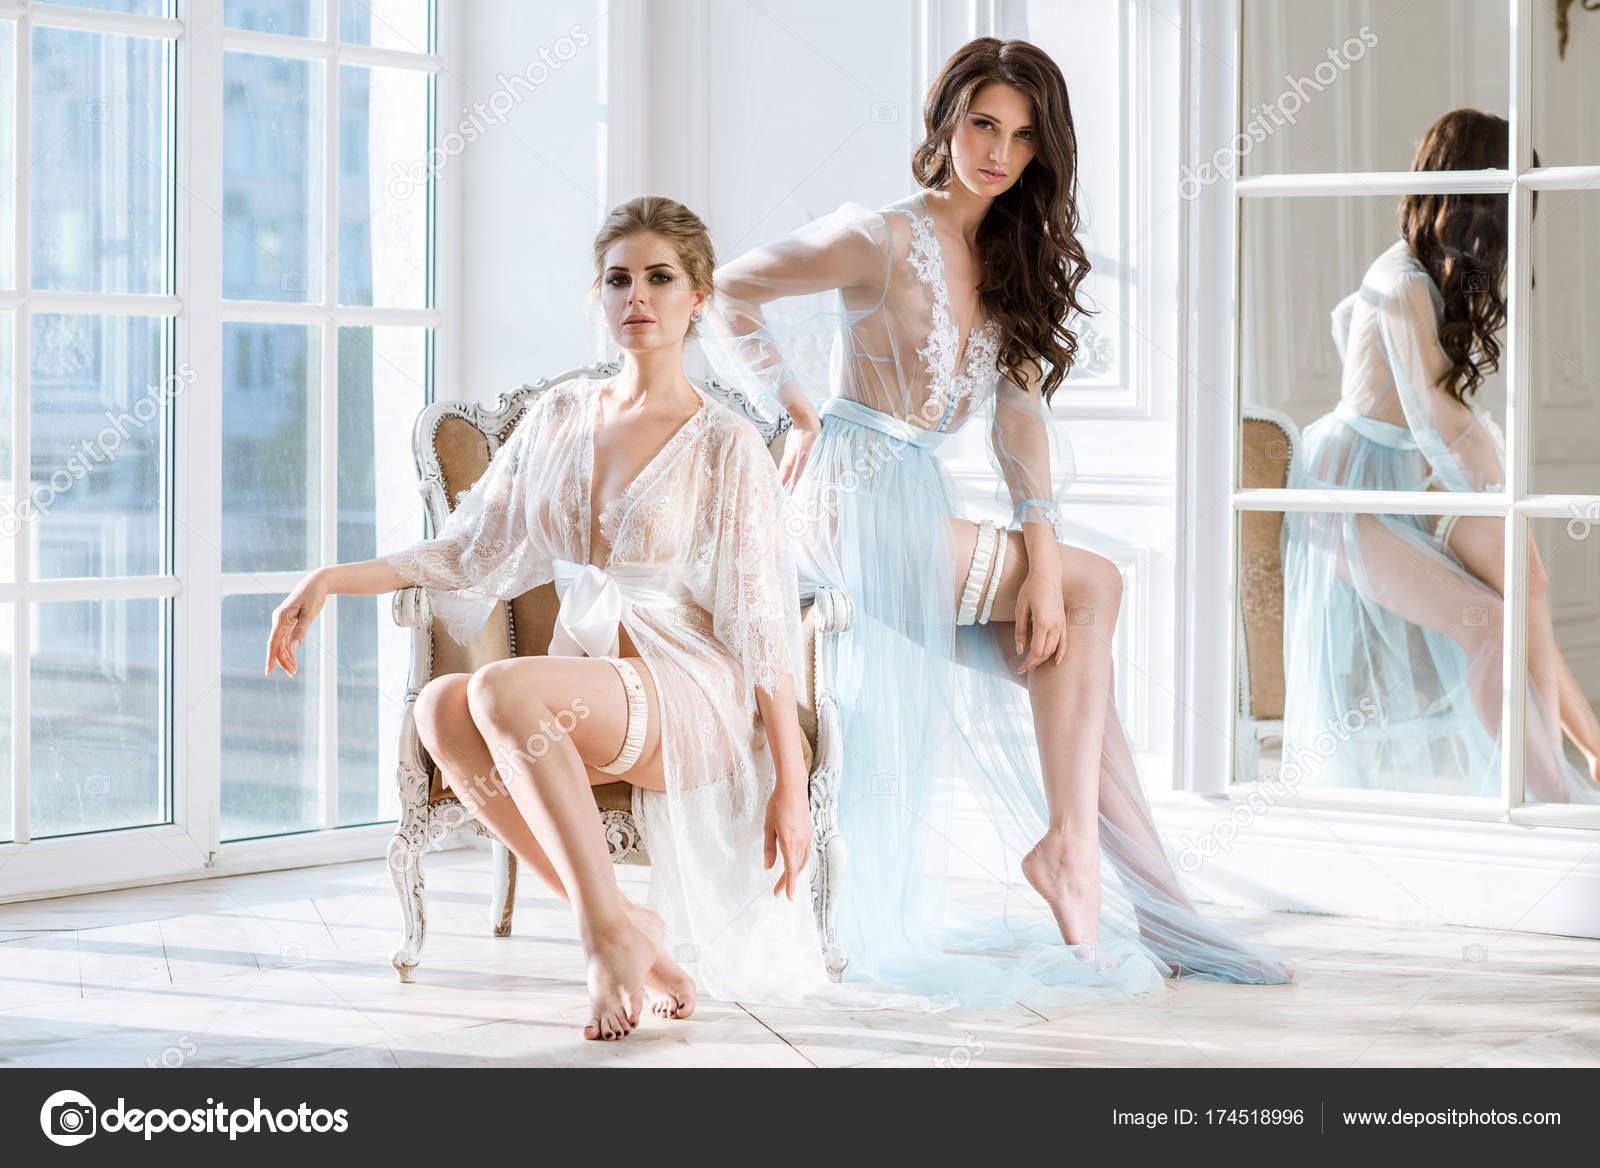 obrázky sexy nahé dámy